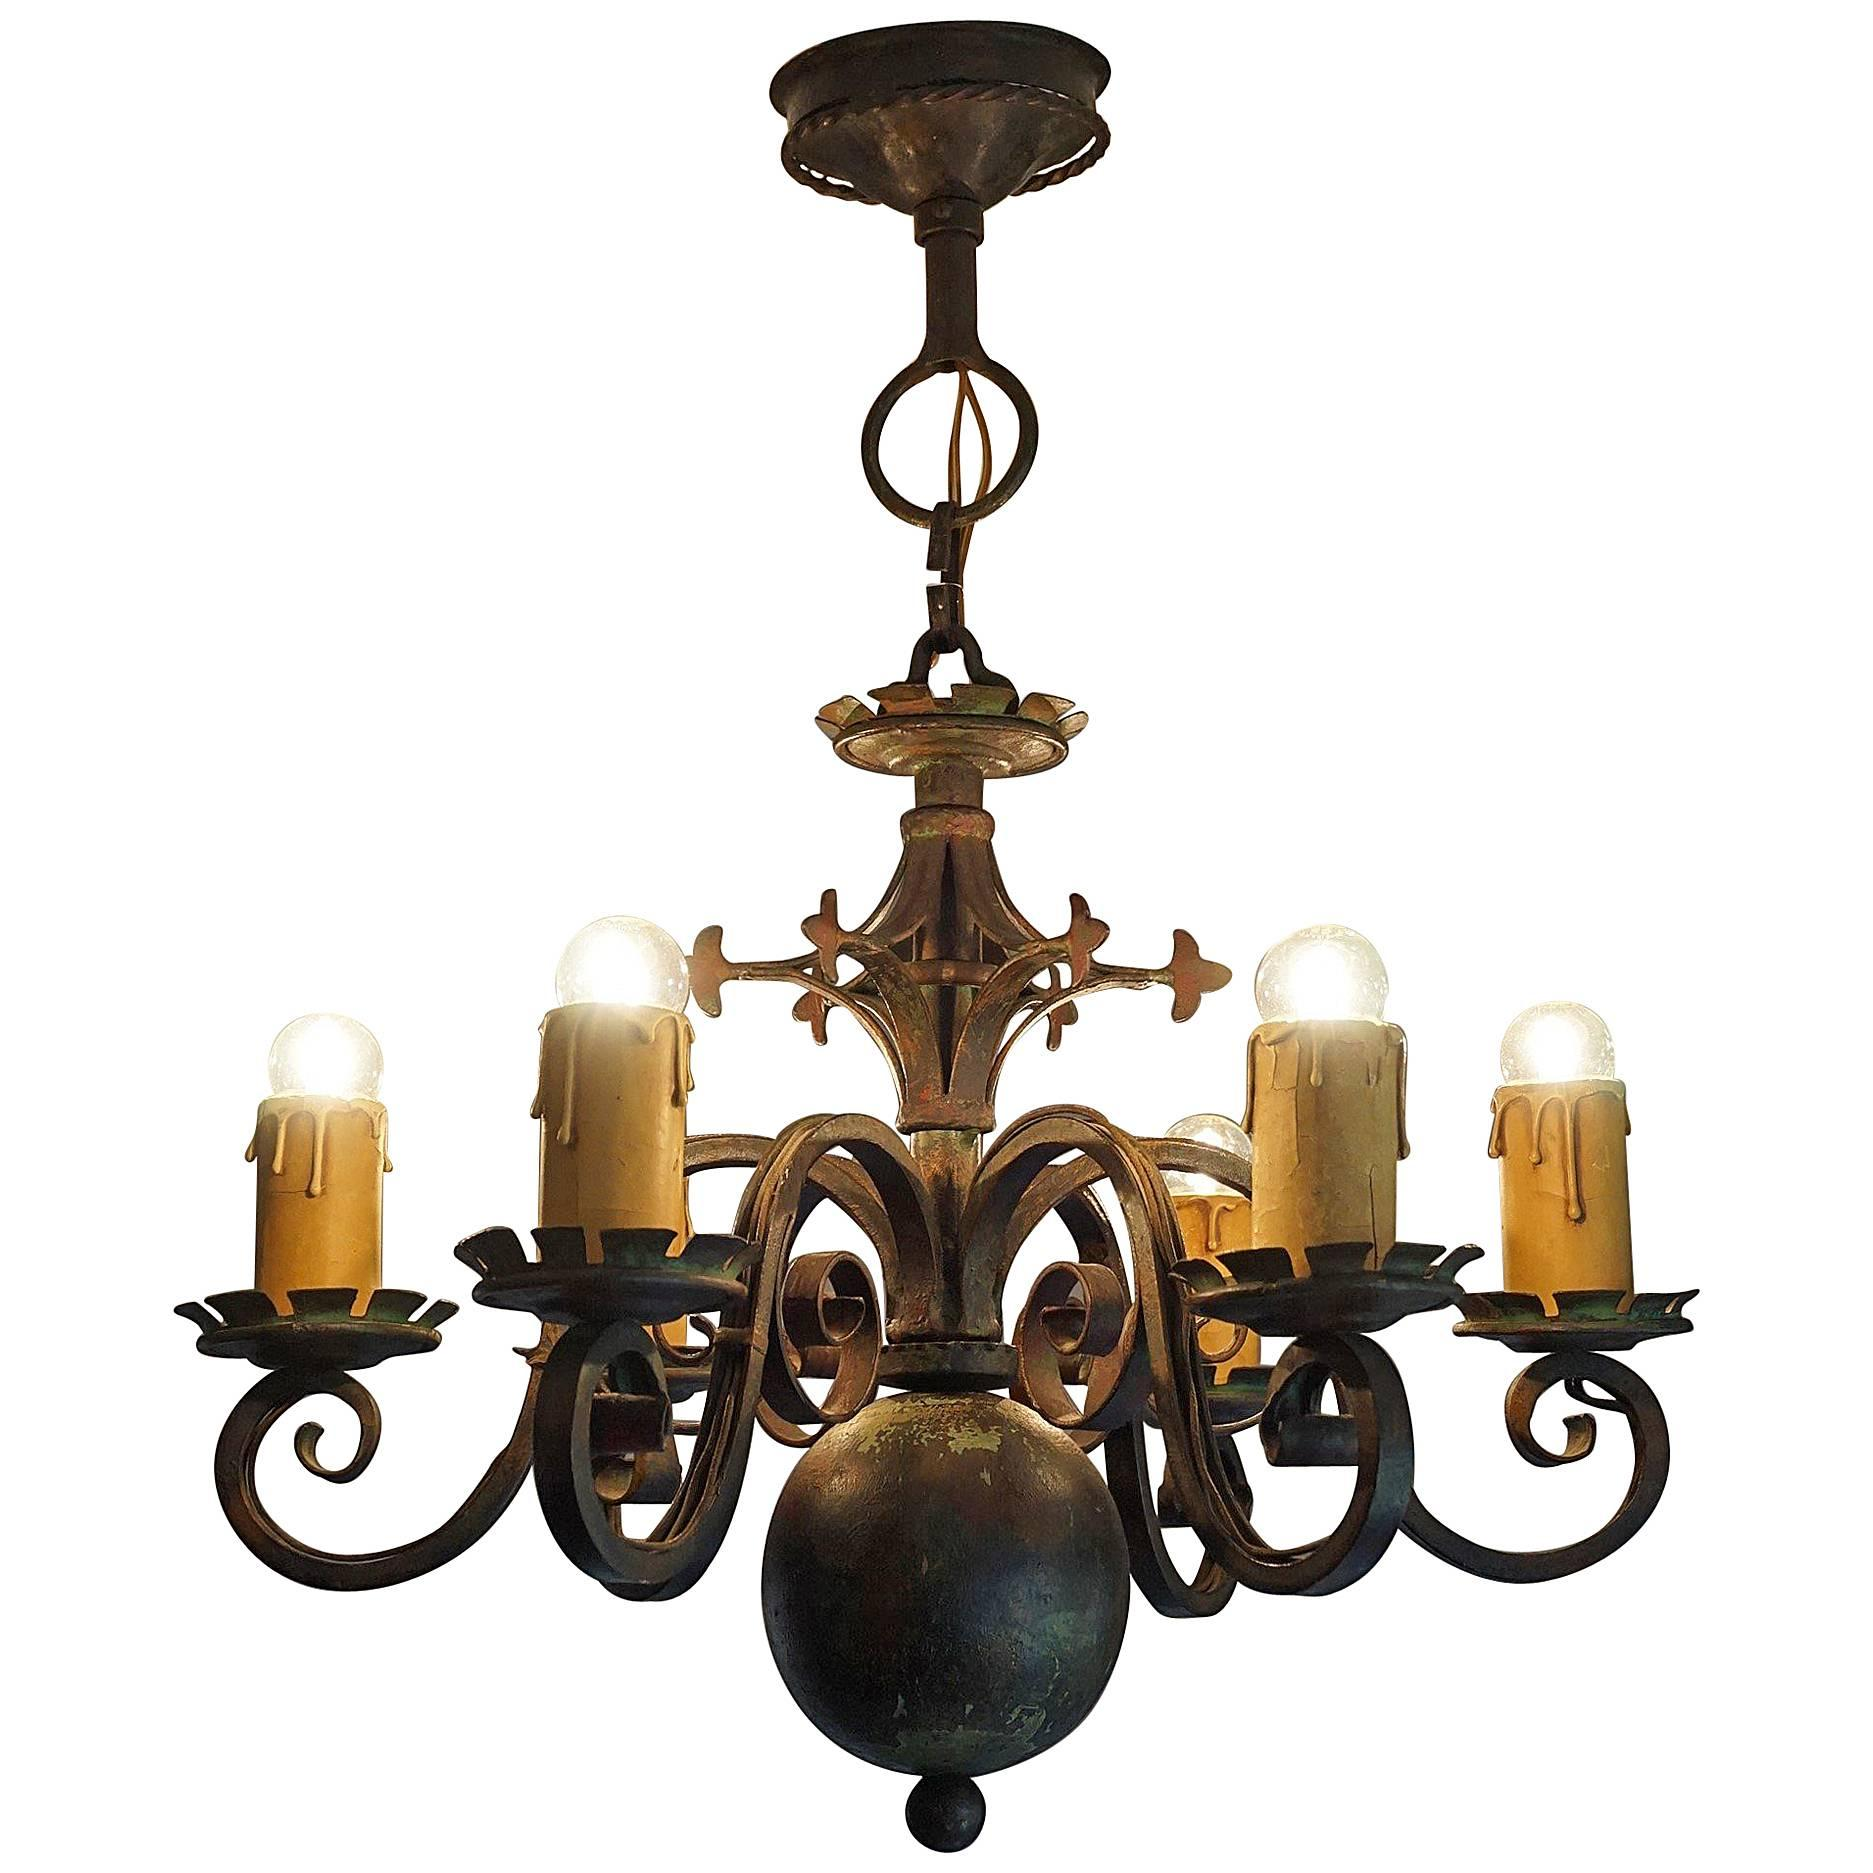 Castle Style Chandelier Lighting Iron Chandelier 6 lights